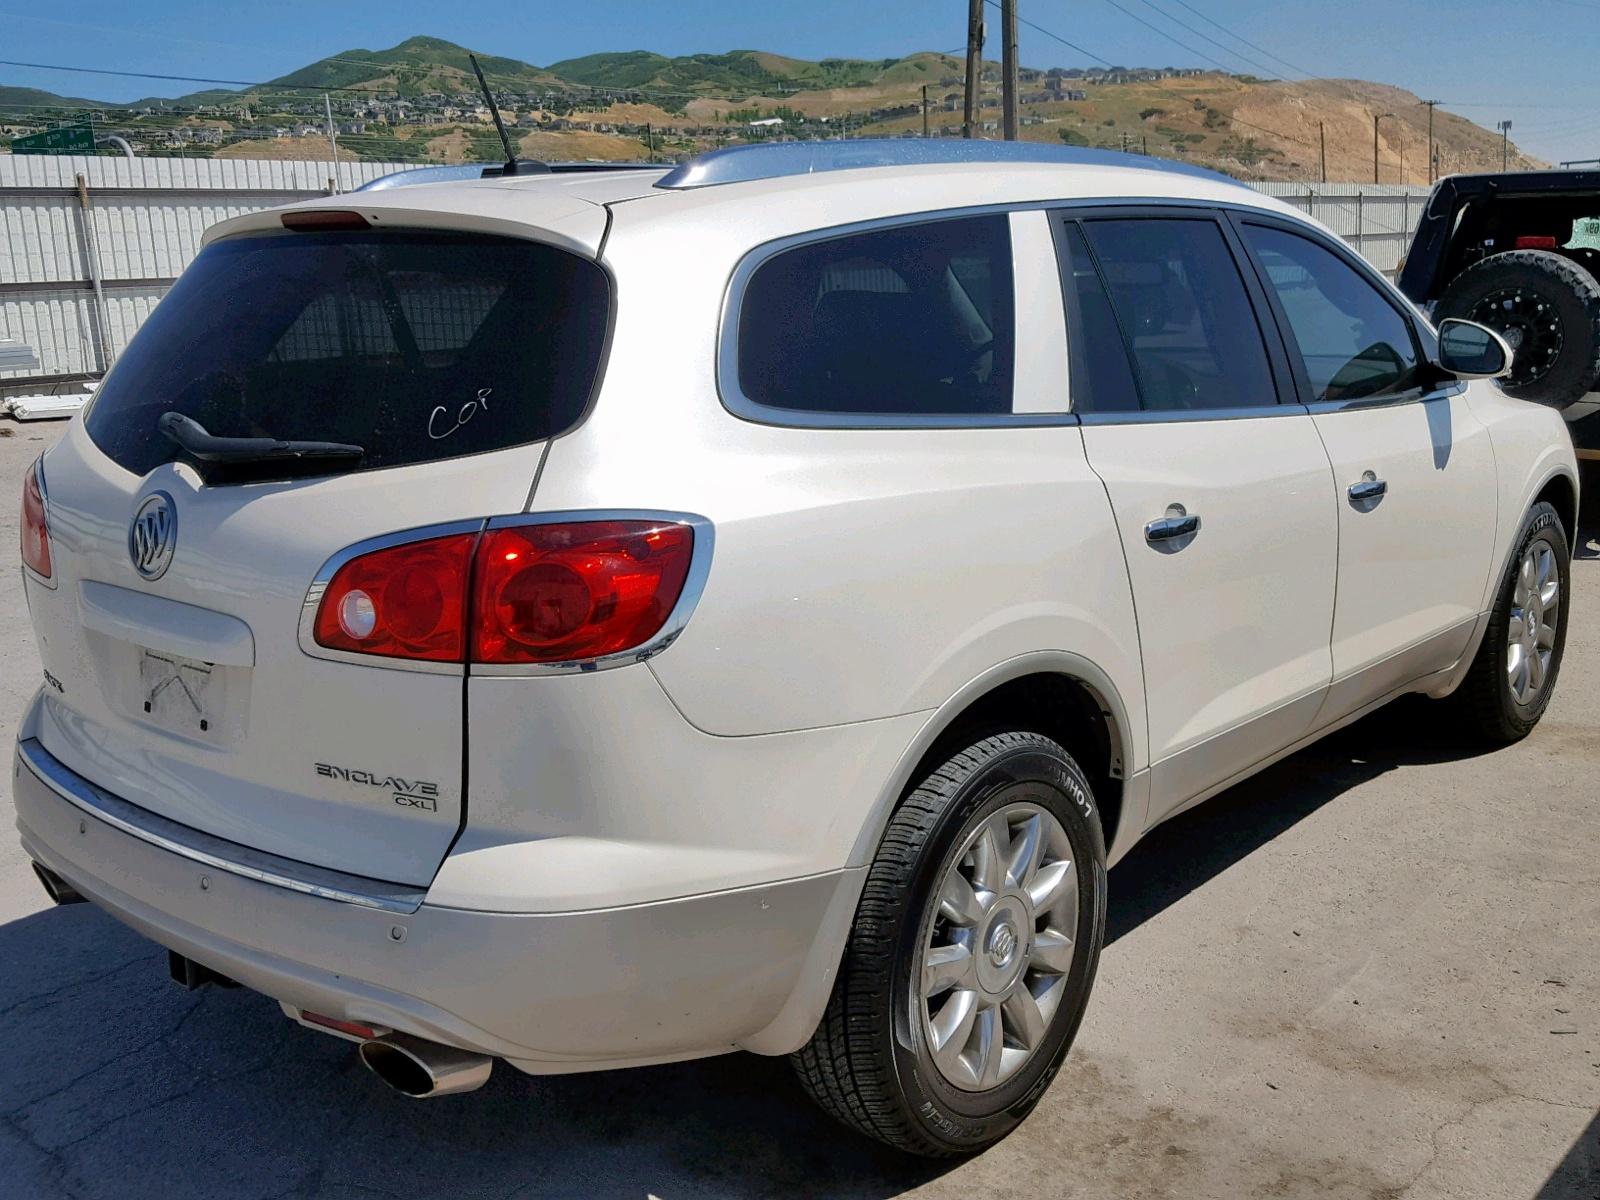 5GAKVCED1CJ321648 - 2012 Buick Enclave 3.6L rear view